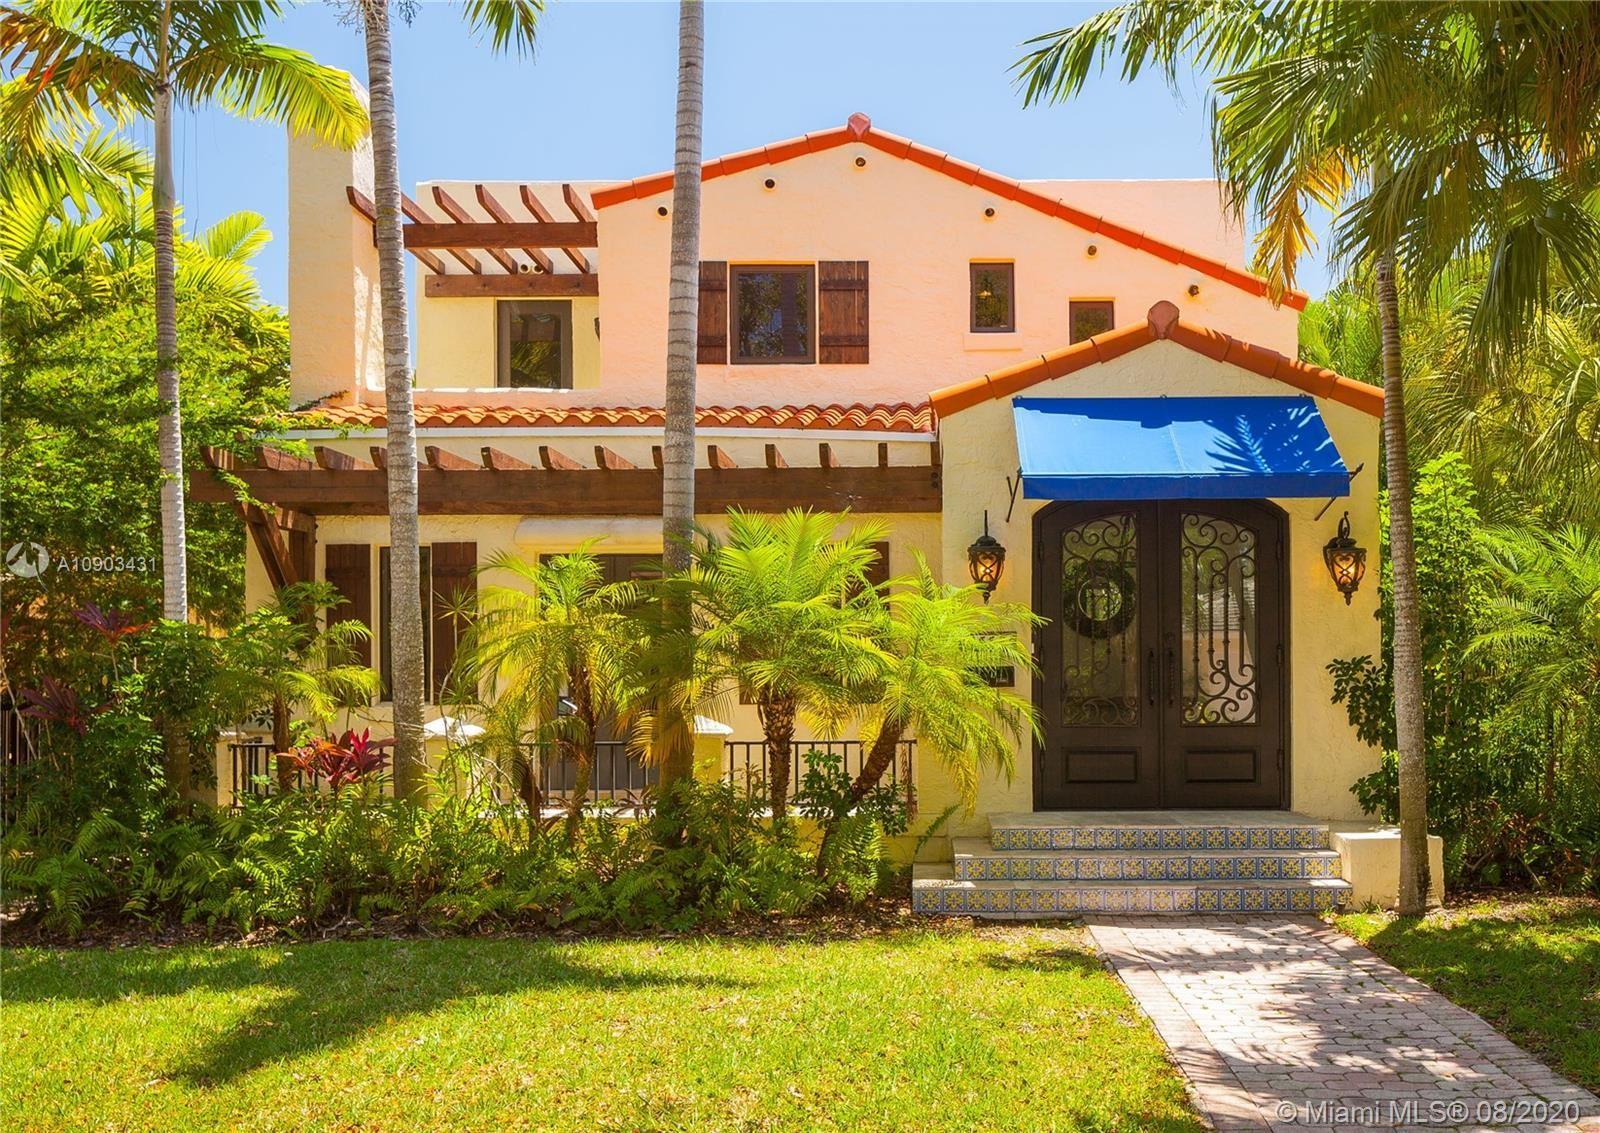 1556 Murcia Ave, Coral Gables, FL 33134 - #: A10903431